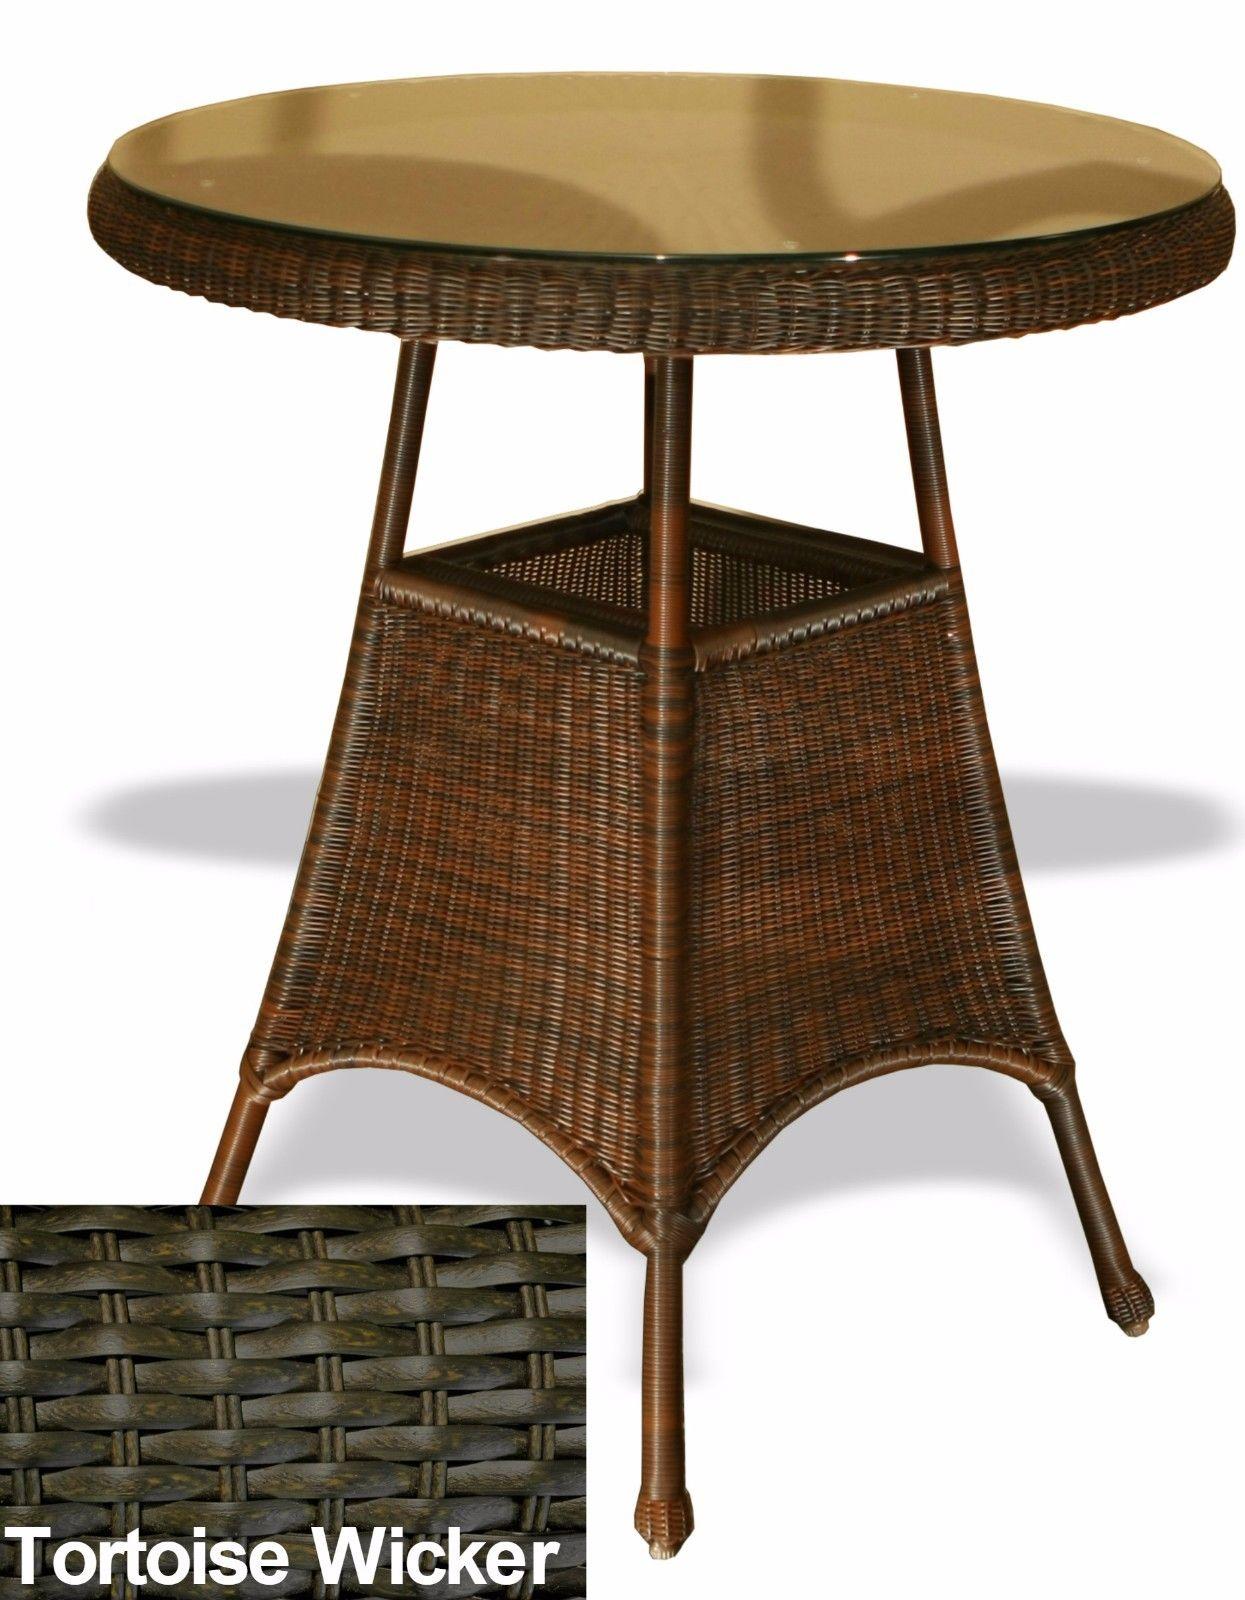 #191 - Stylish Modern Outdoor Patio Garden Bar Table in Tortoise All Weather Wicker